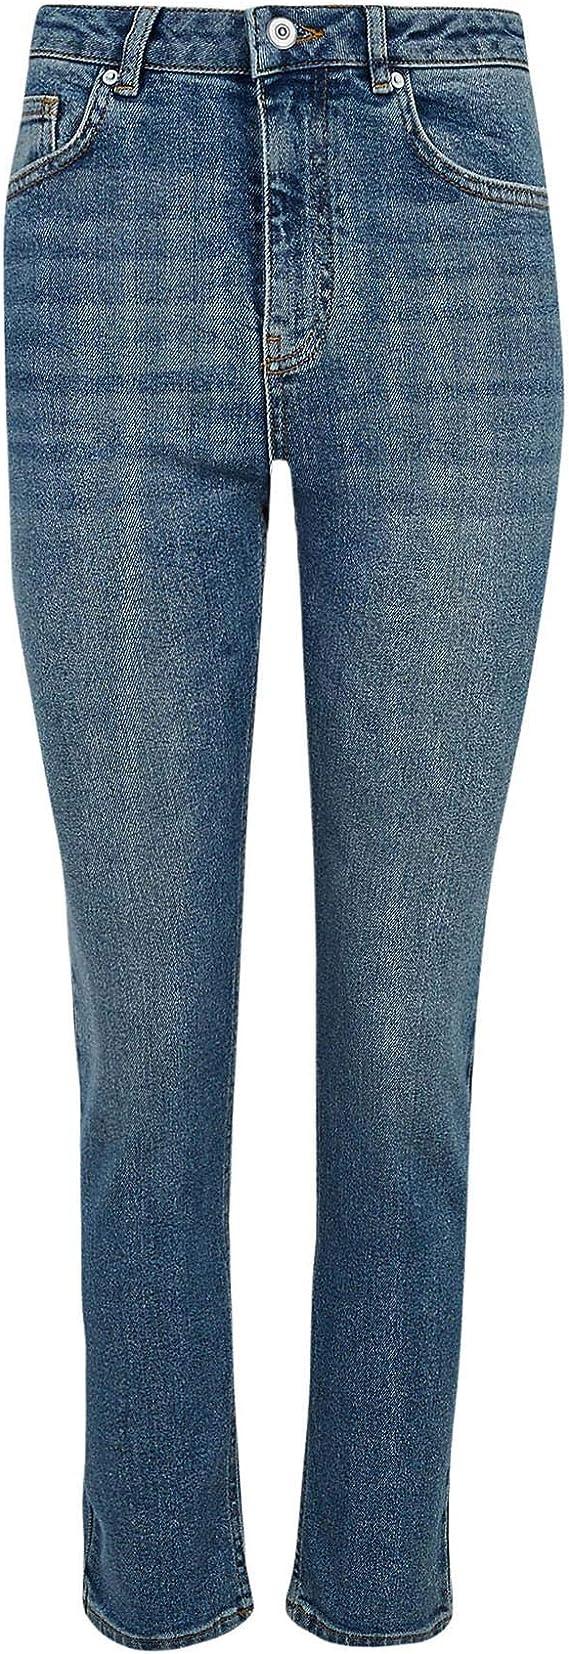 PER UNA Roma Fit SKINNY Ankle Skimmer JEANS ~ Size 18 Regular ~ GREY